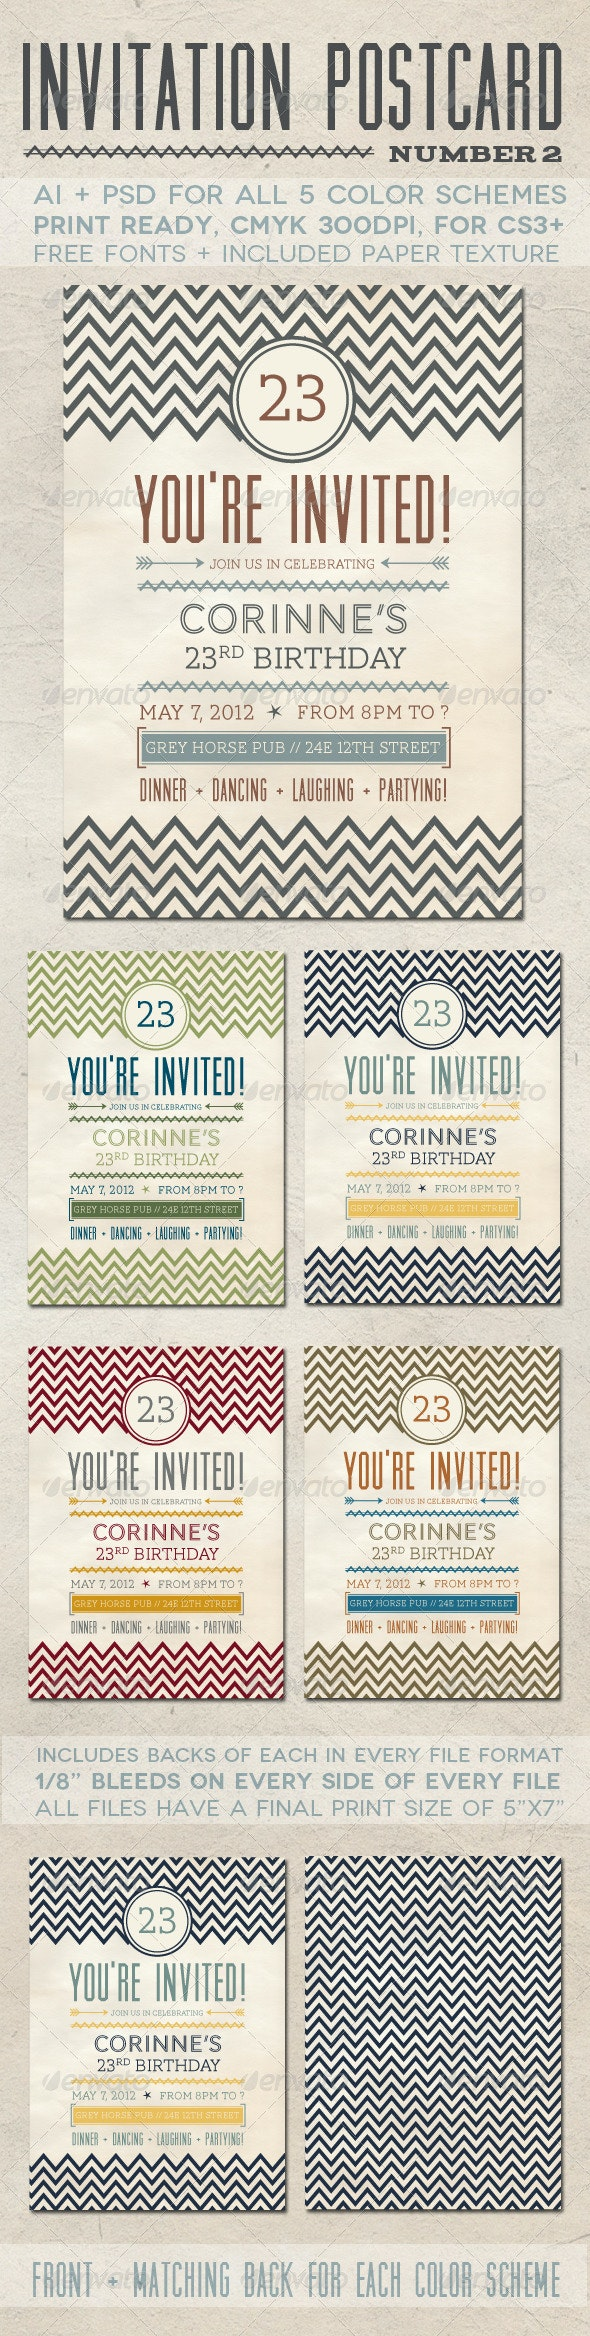 Invitation Postcard 2 - Invitations Cards & Invites